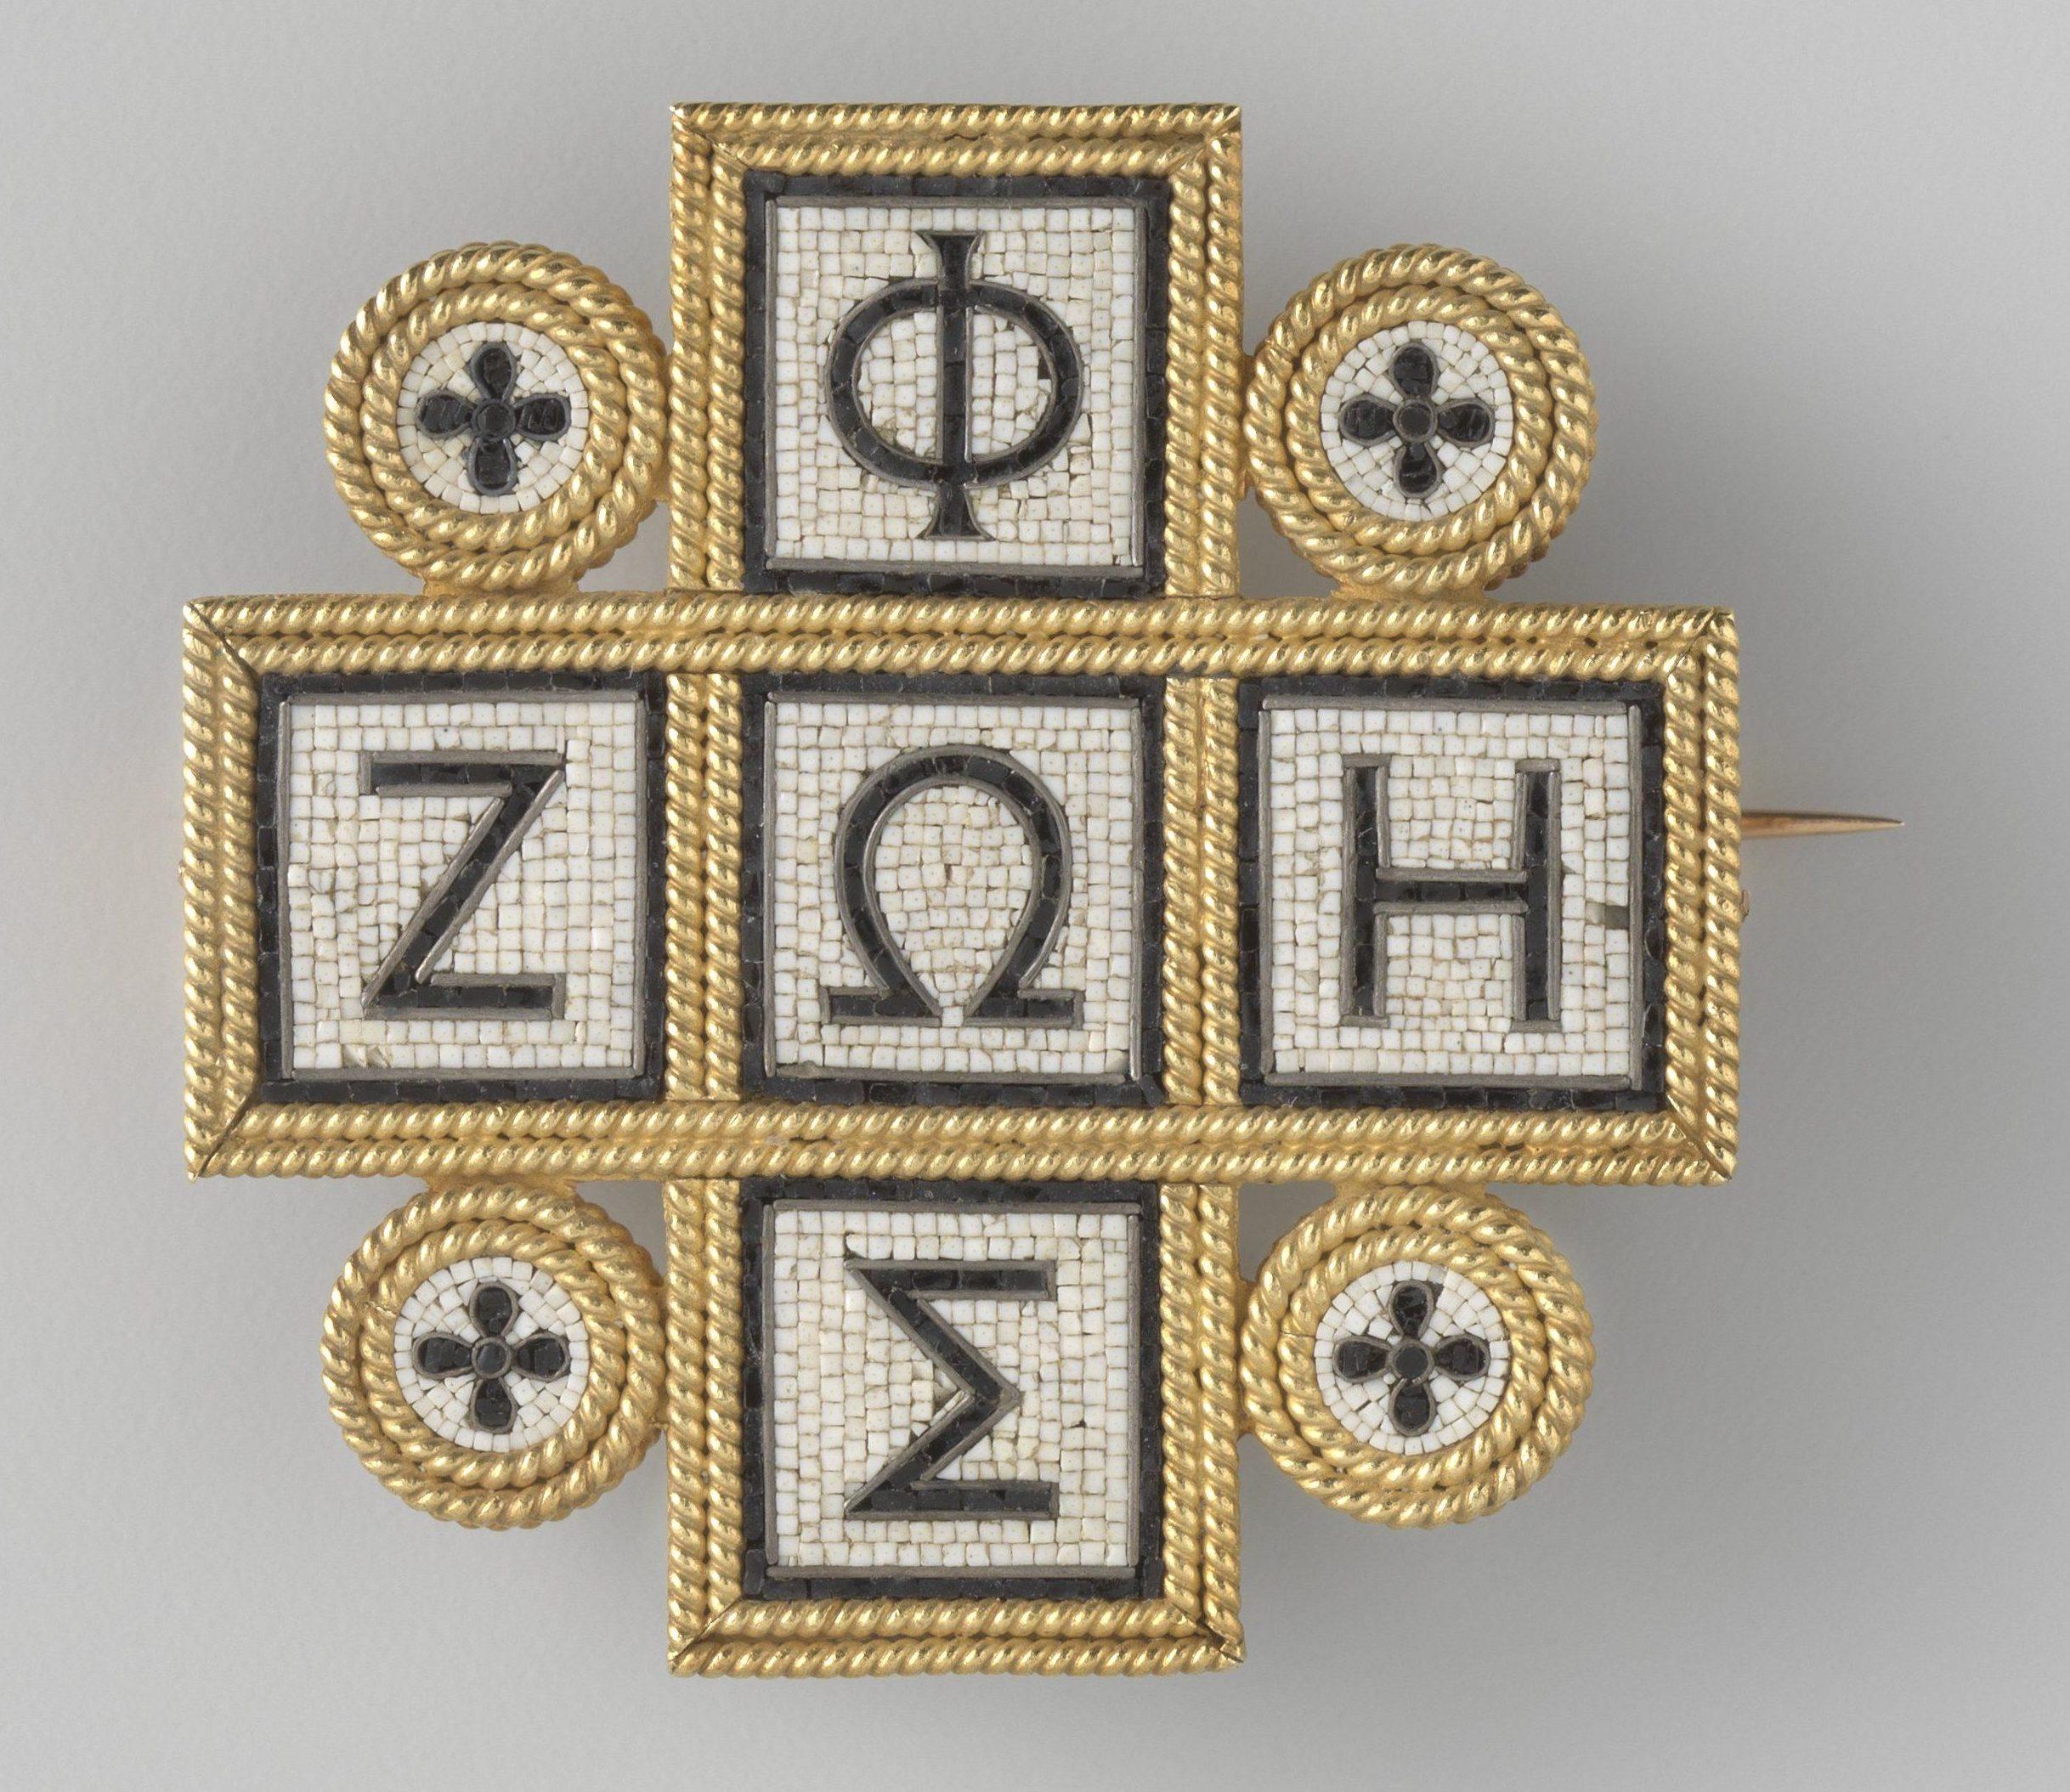 Alessandro Castellani, broche, circa 1870. Collectie Rijksmuseum, BK-1978-417, goud, micro mozaïek, stenen